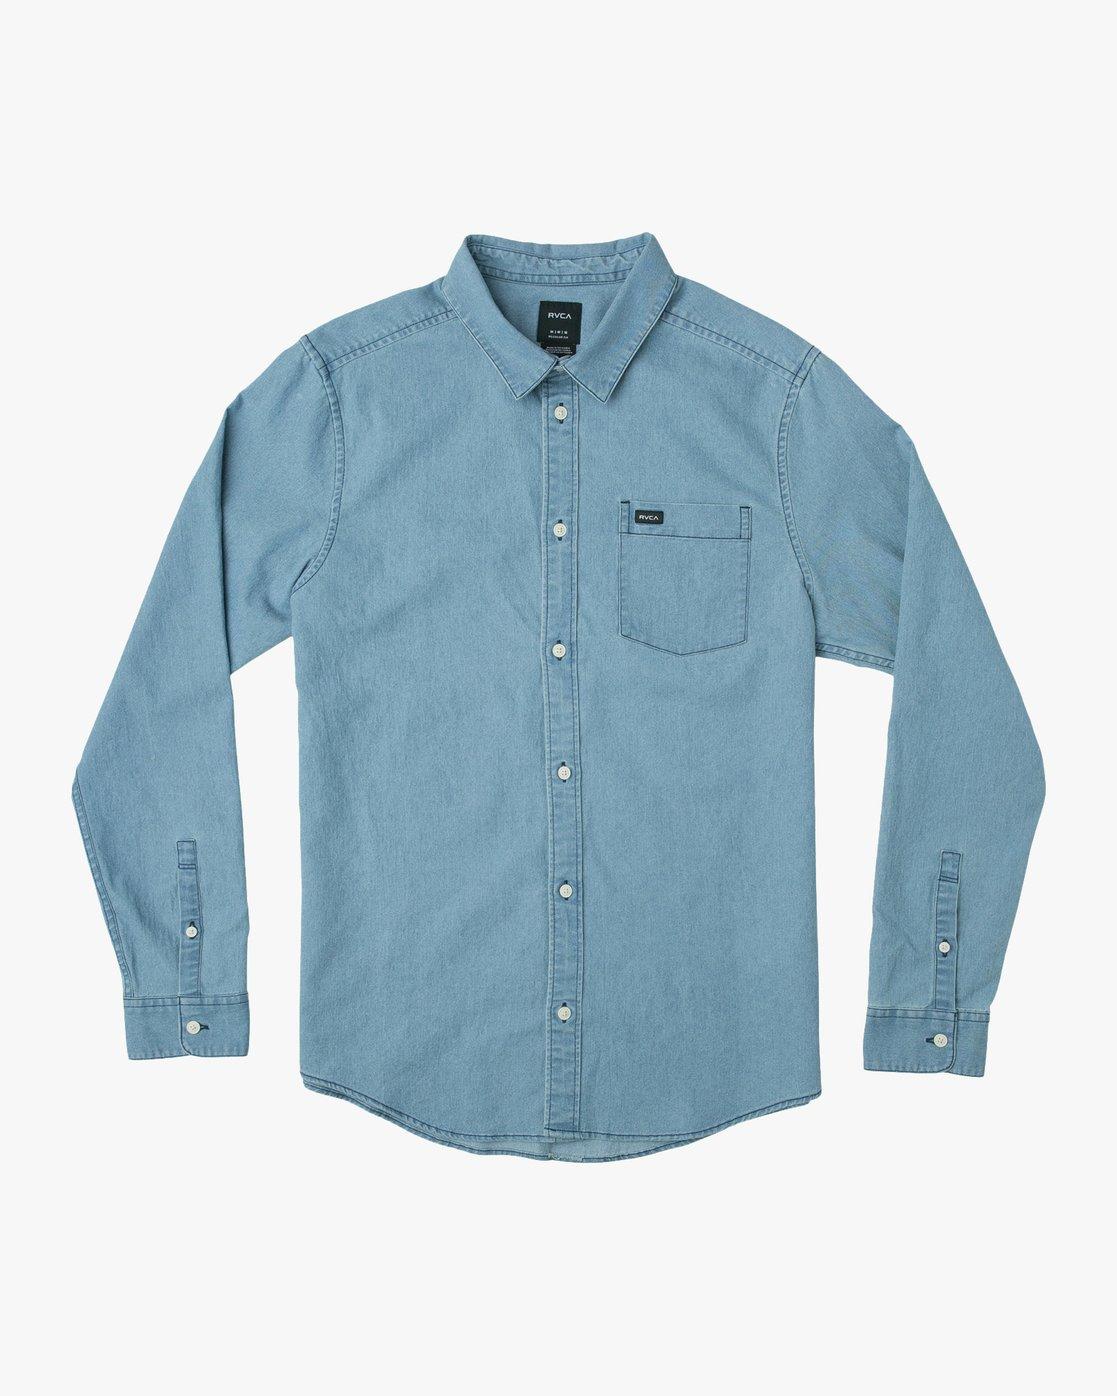 0 Nakama Long Sleeve Button-Up Shirt Blue M557TRND RVCA